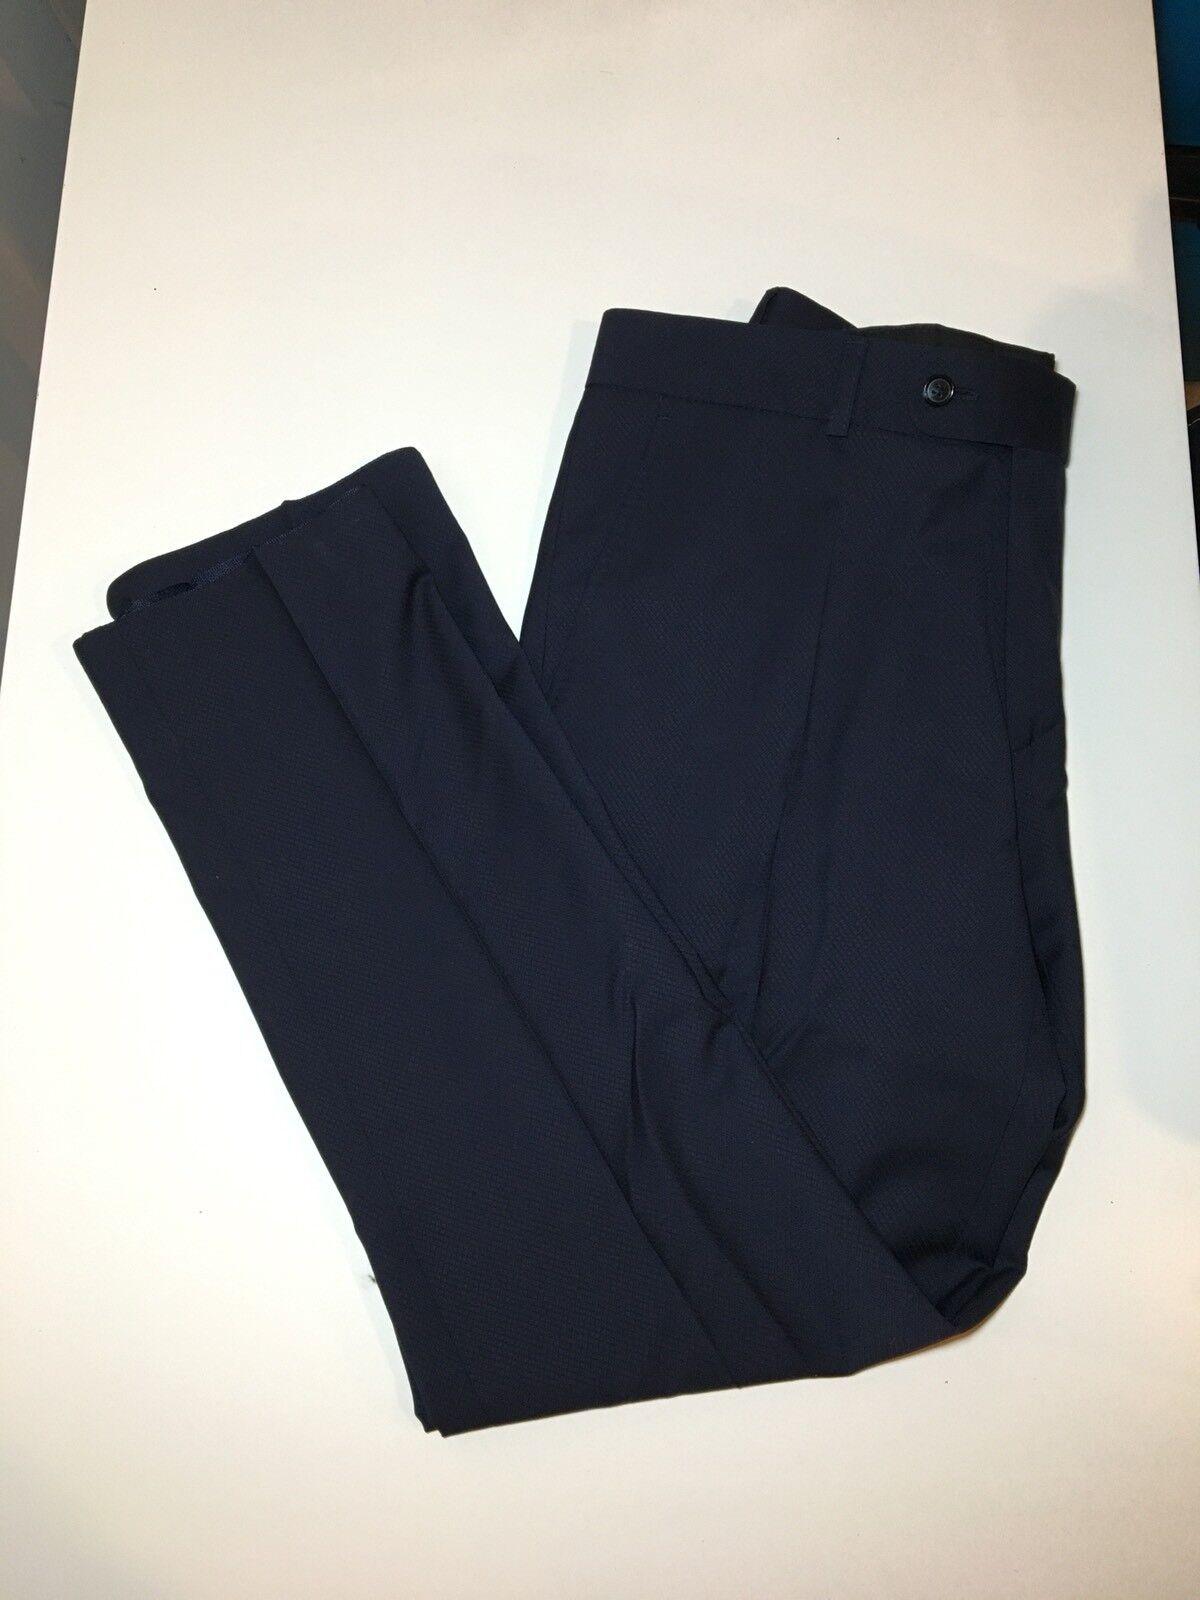 Carl Gross Mens Trousers 50-043N1-63 Size 30S UK